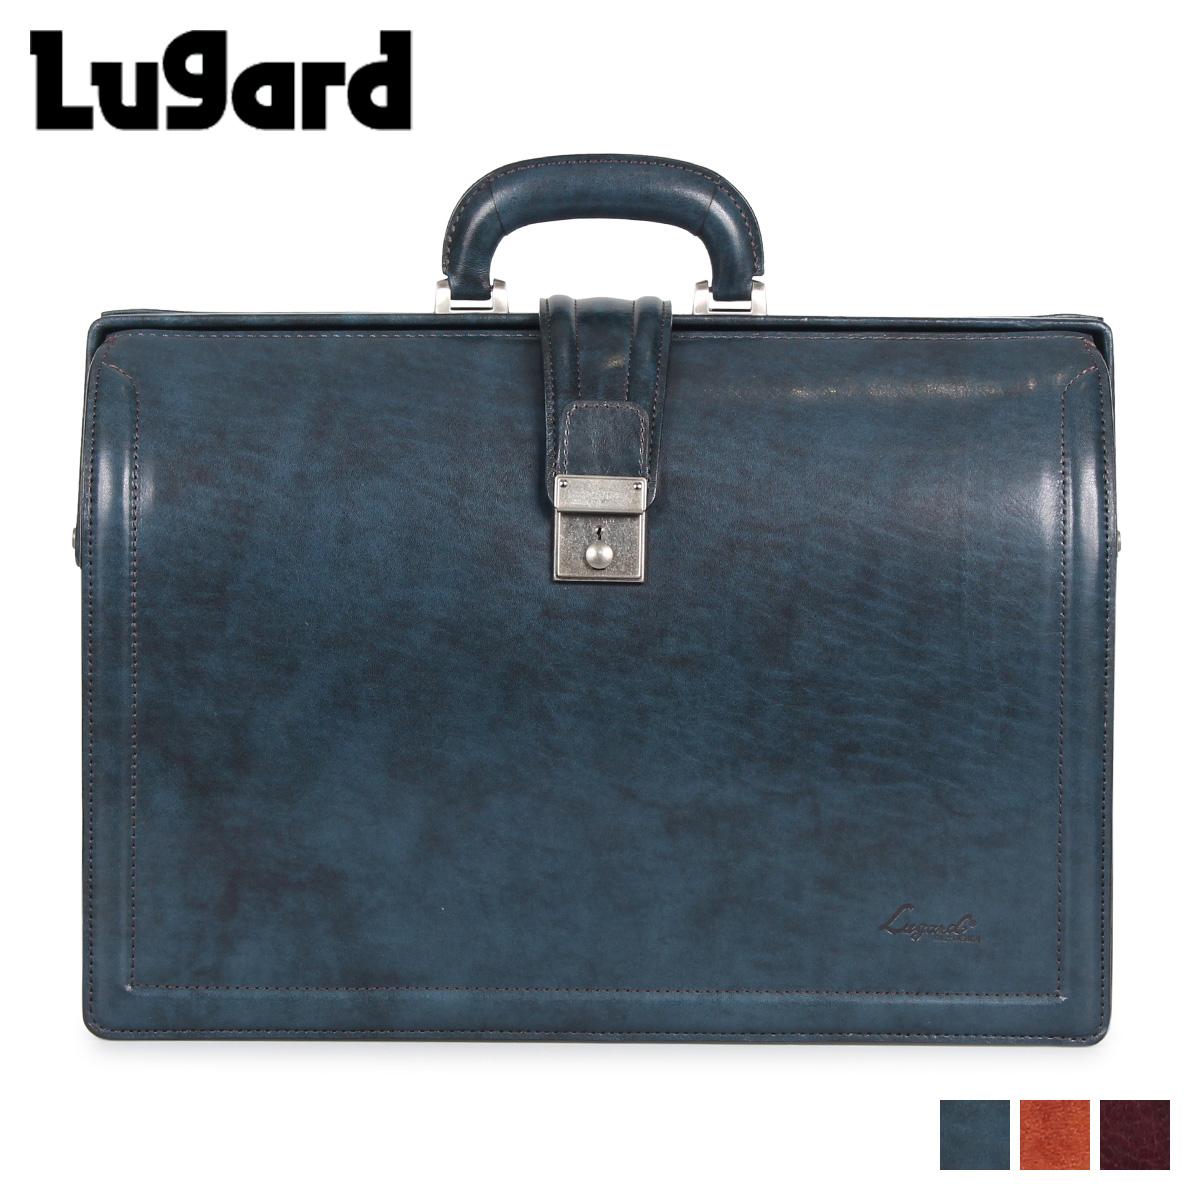 Lugard ラガード 青木鞄 ジースリー バッグ ダレスバッグ ビジネスバッグ メンズ G3 BUSINESS BAG ネイビー ブラウン ボルドー 5224